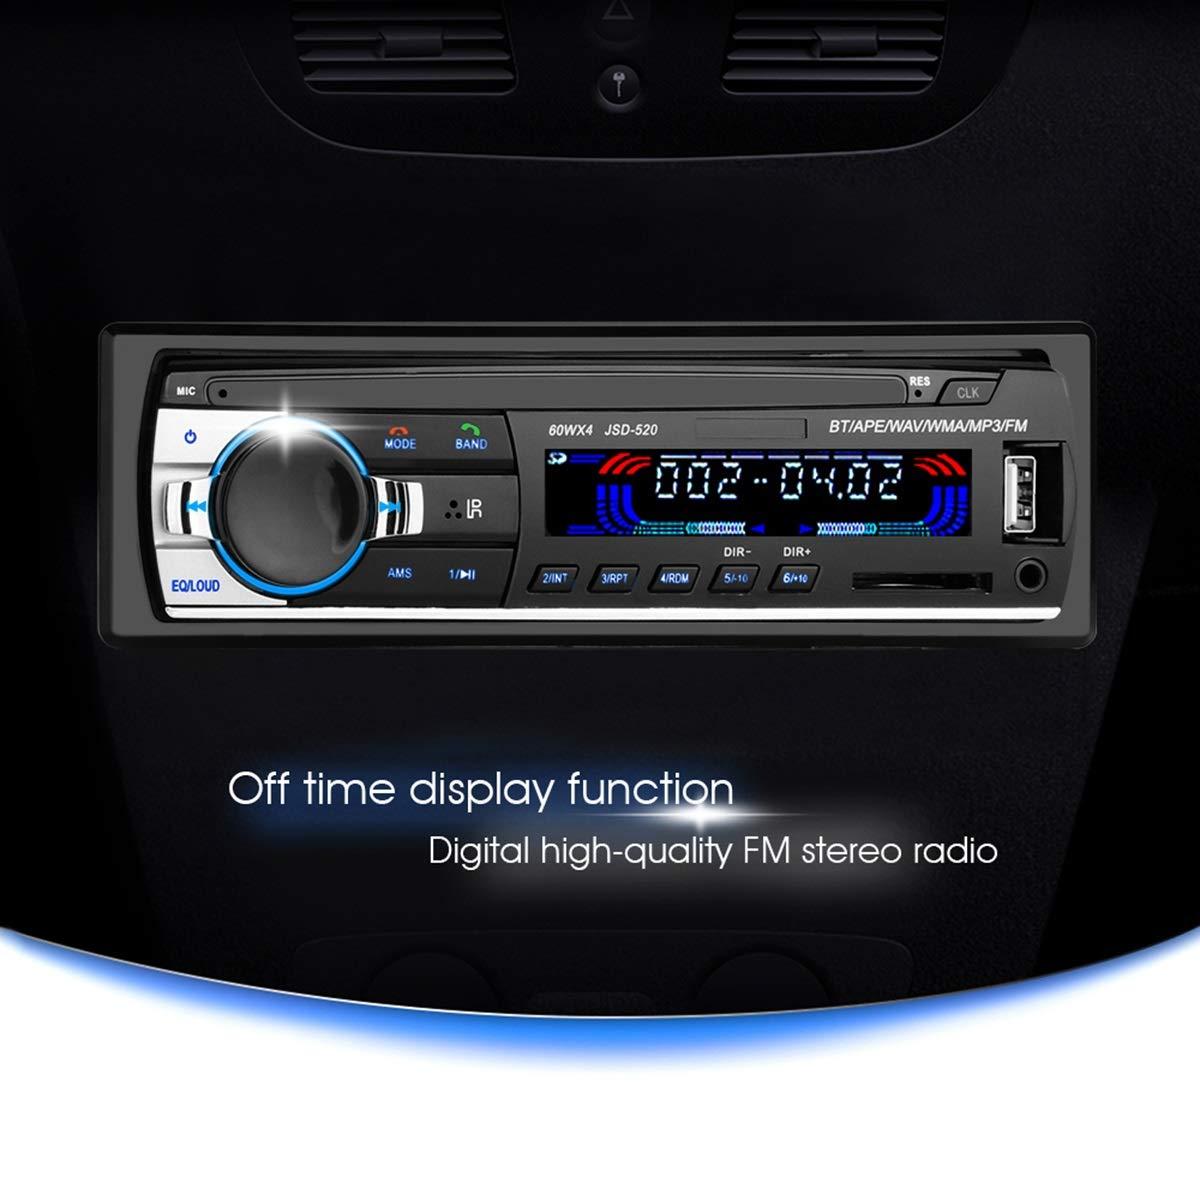 Wallfire Altoparlante per Auto Autoradio Autoradio JSD 520 12V Bluetooth Car Stereo in-Dash FM Aux Input Receiver Autoradio Player